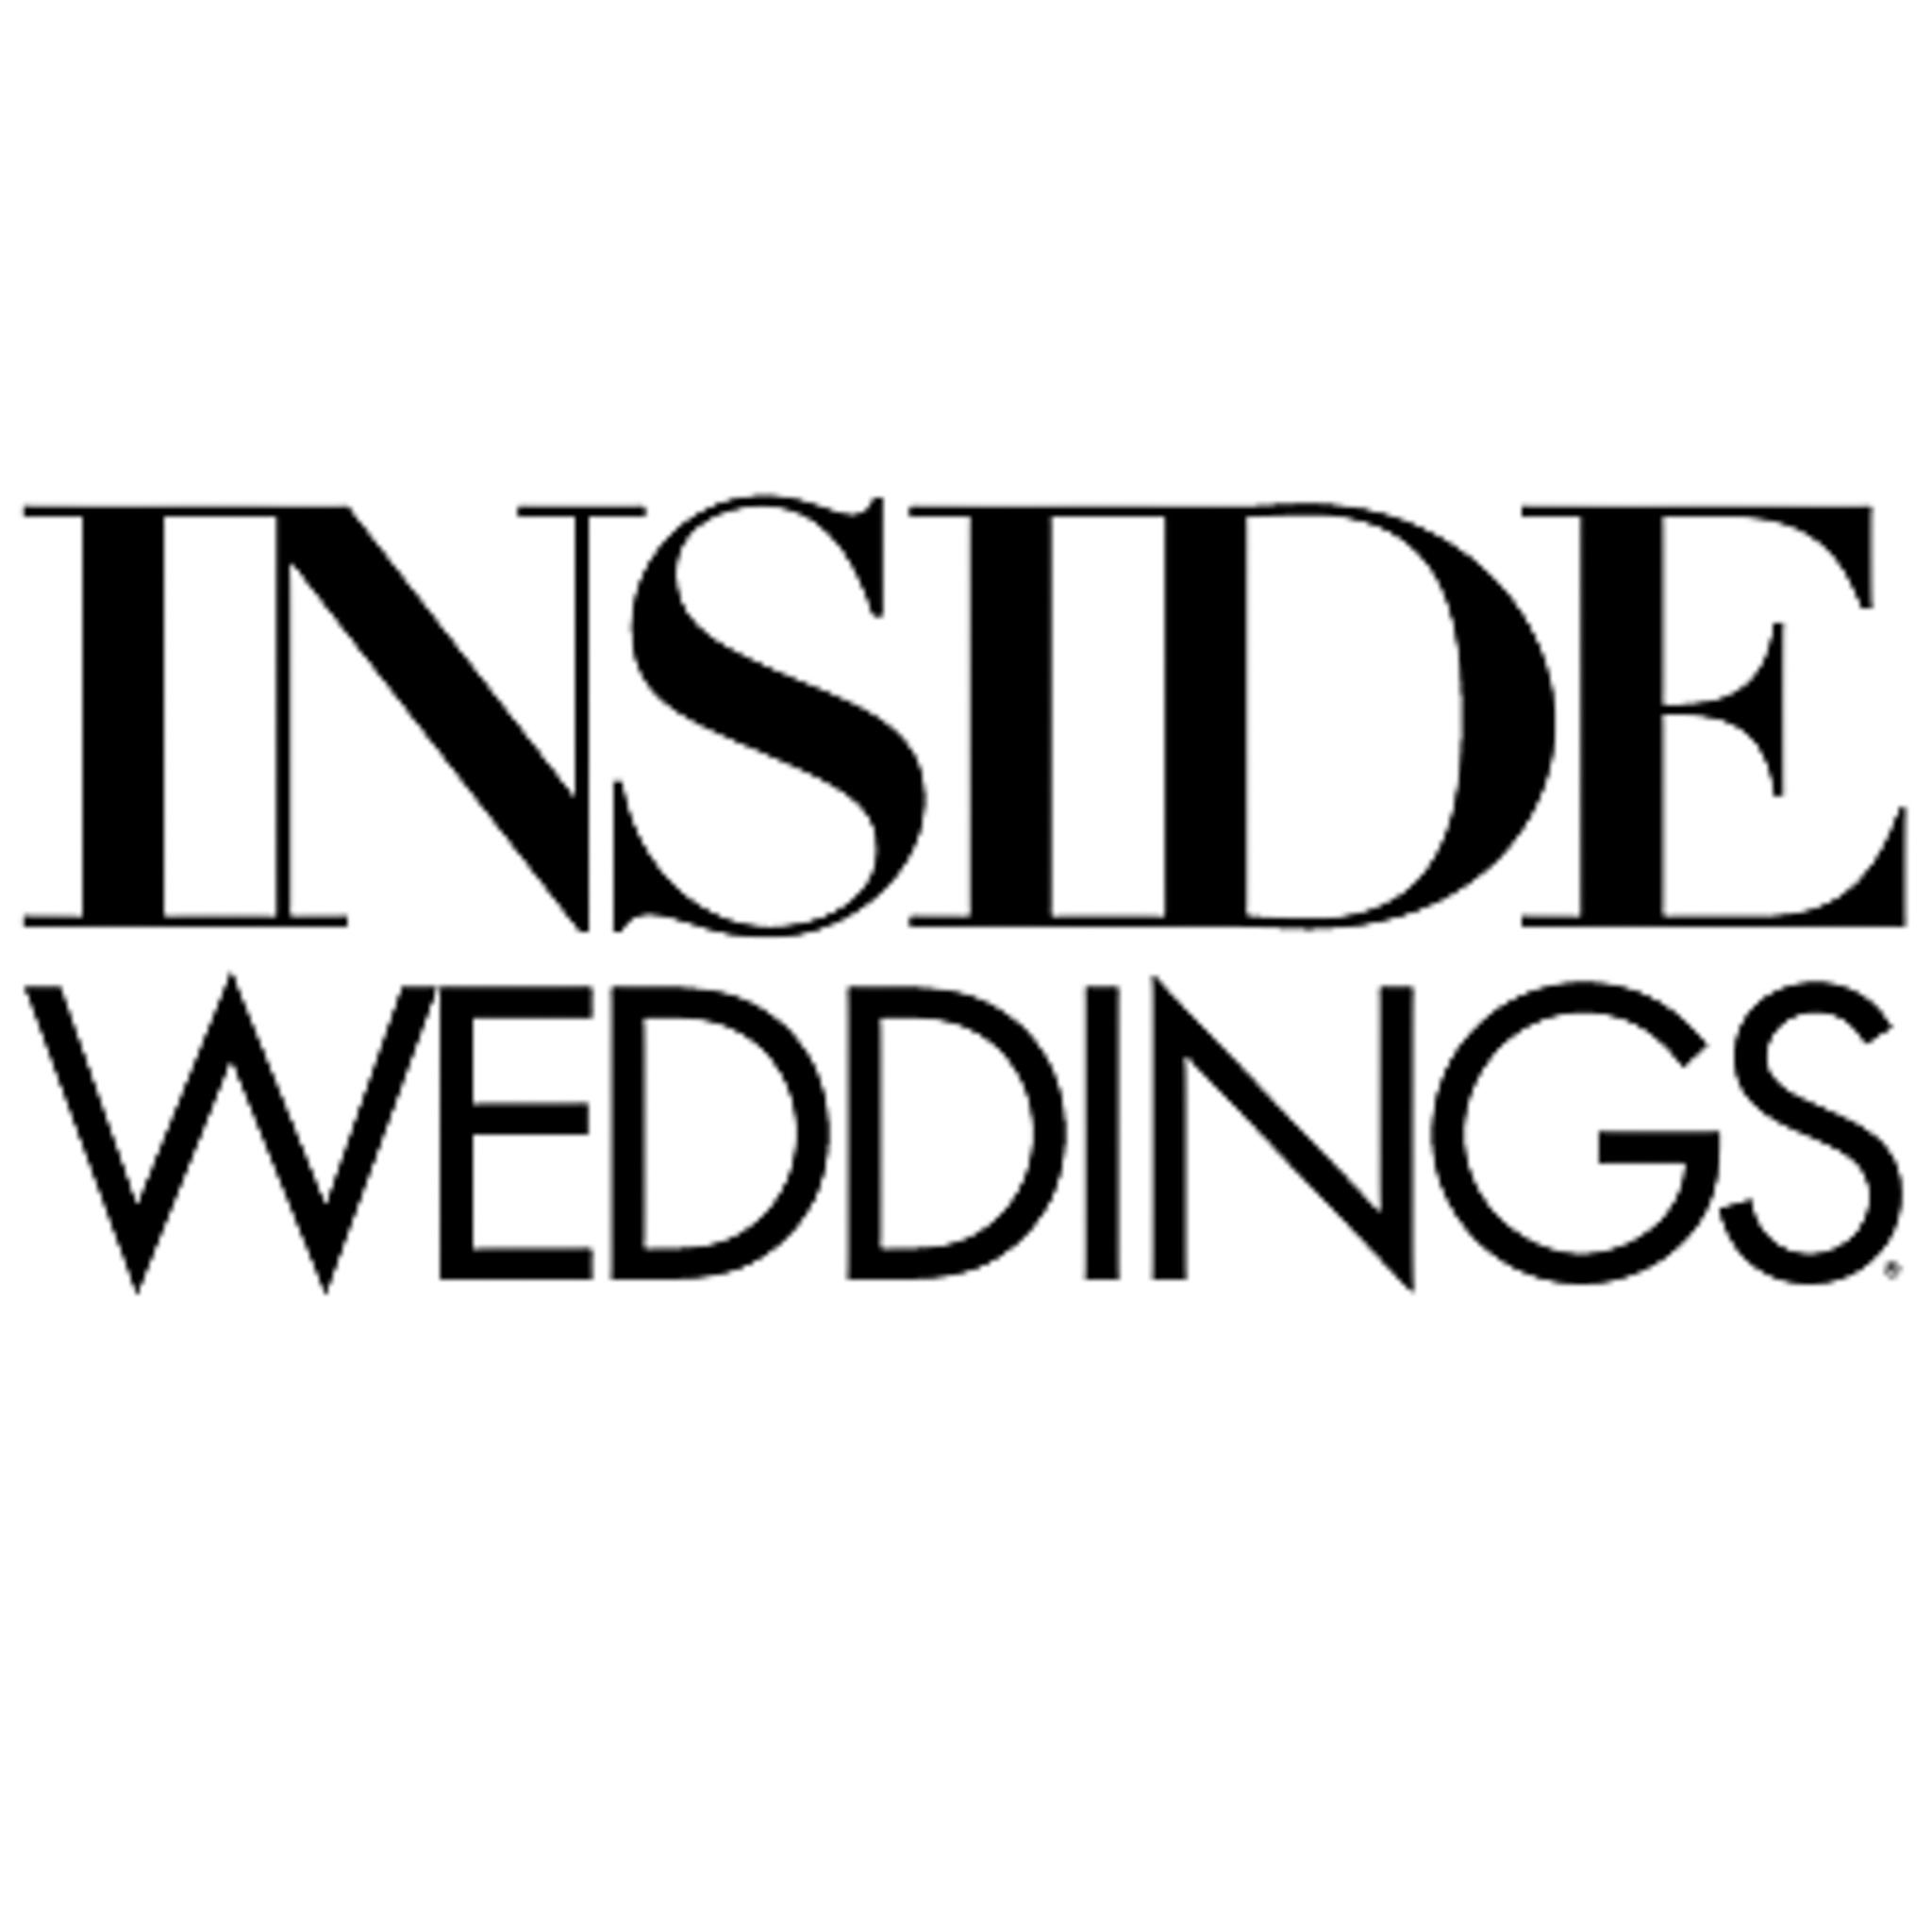 Inside Weddings.jpg